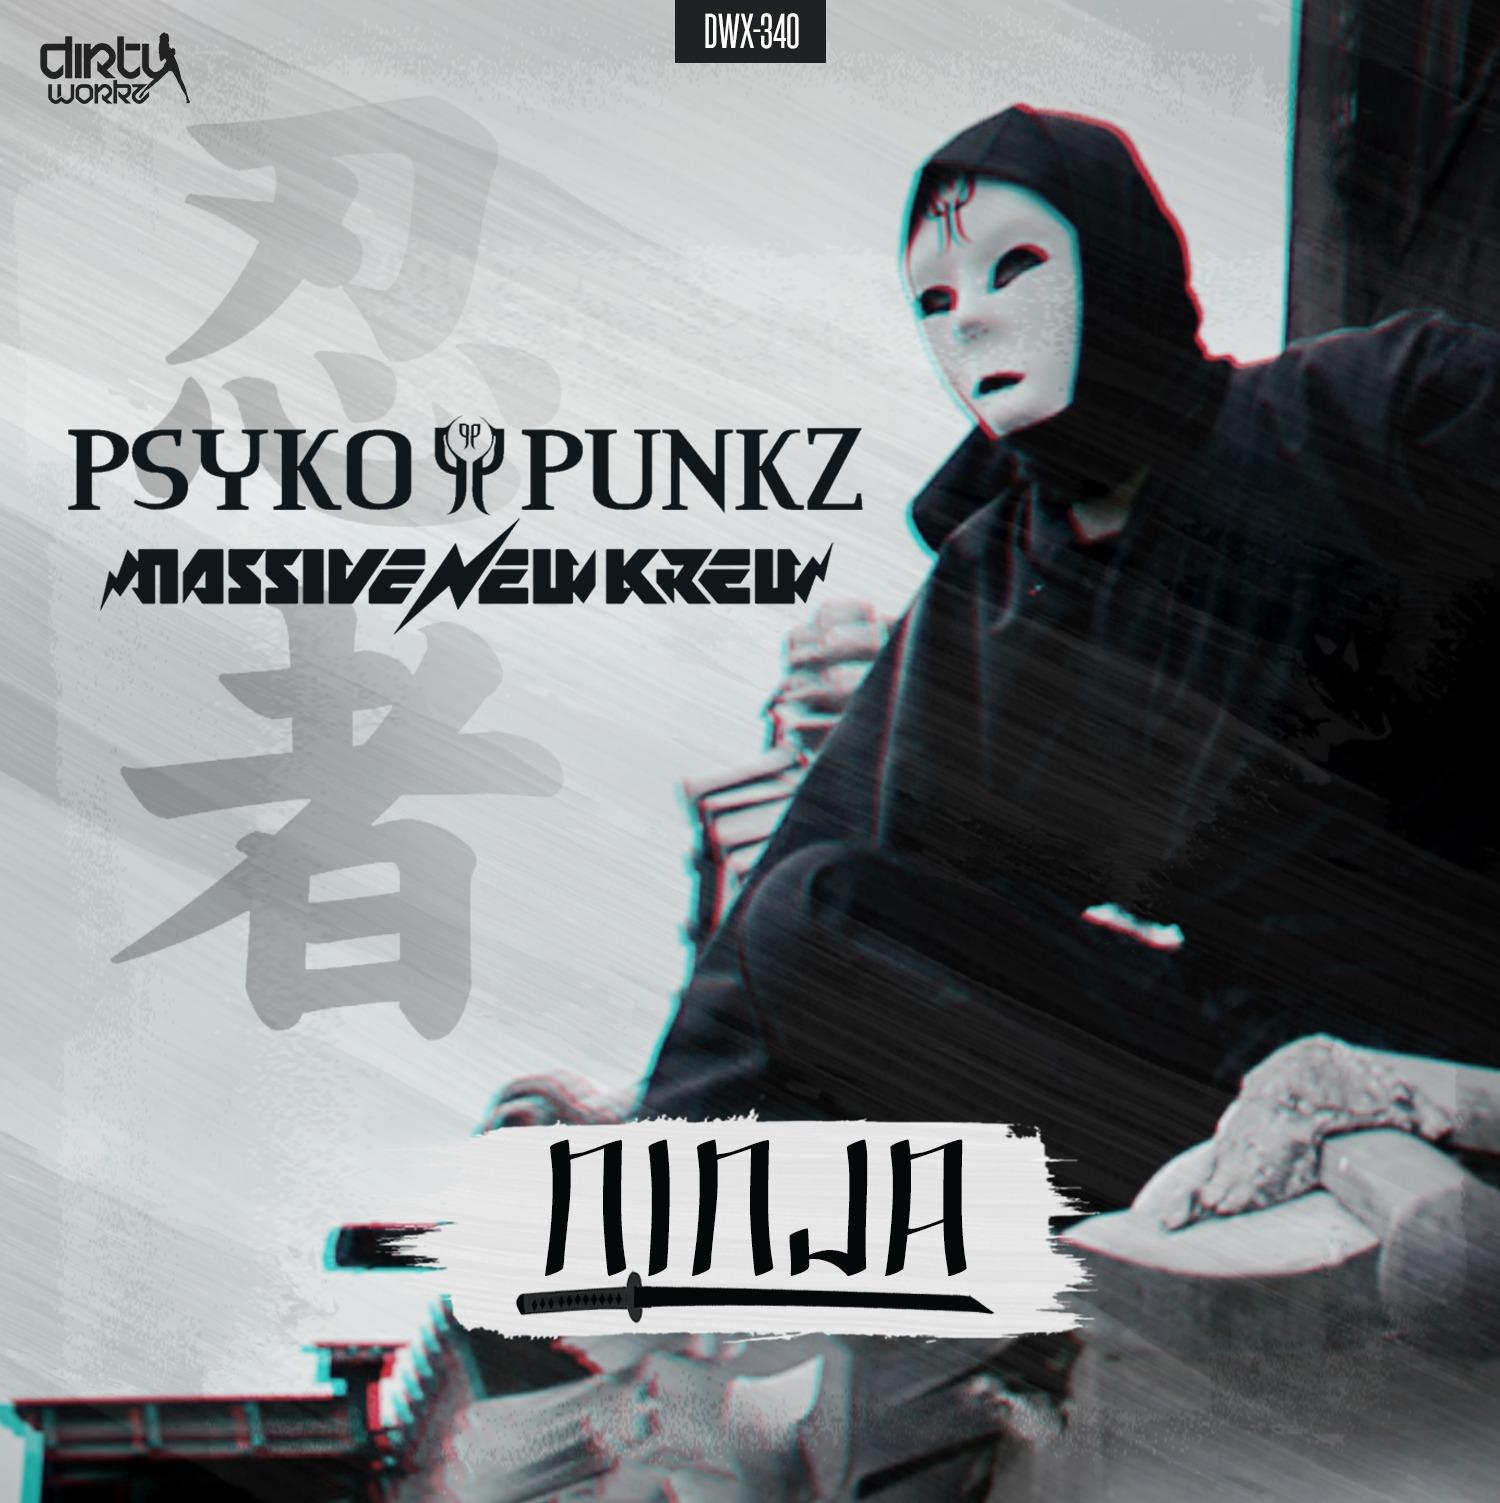 Psyko Punkz Ft. Massive New Krew - Ninja [DIRTY WORKZ] DWX340